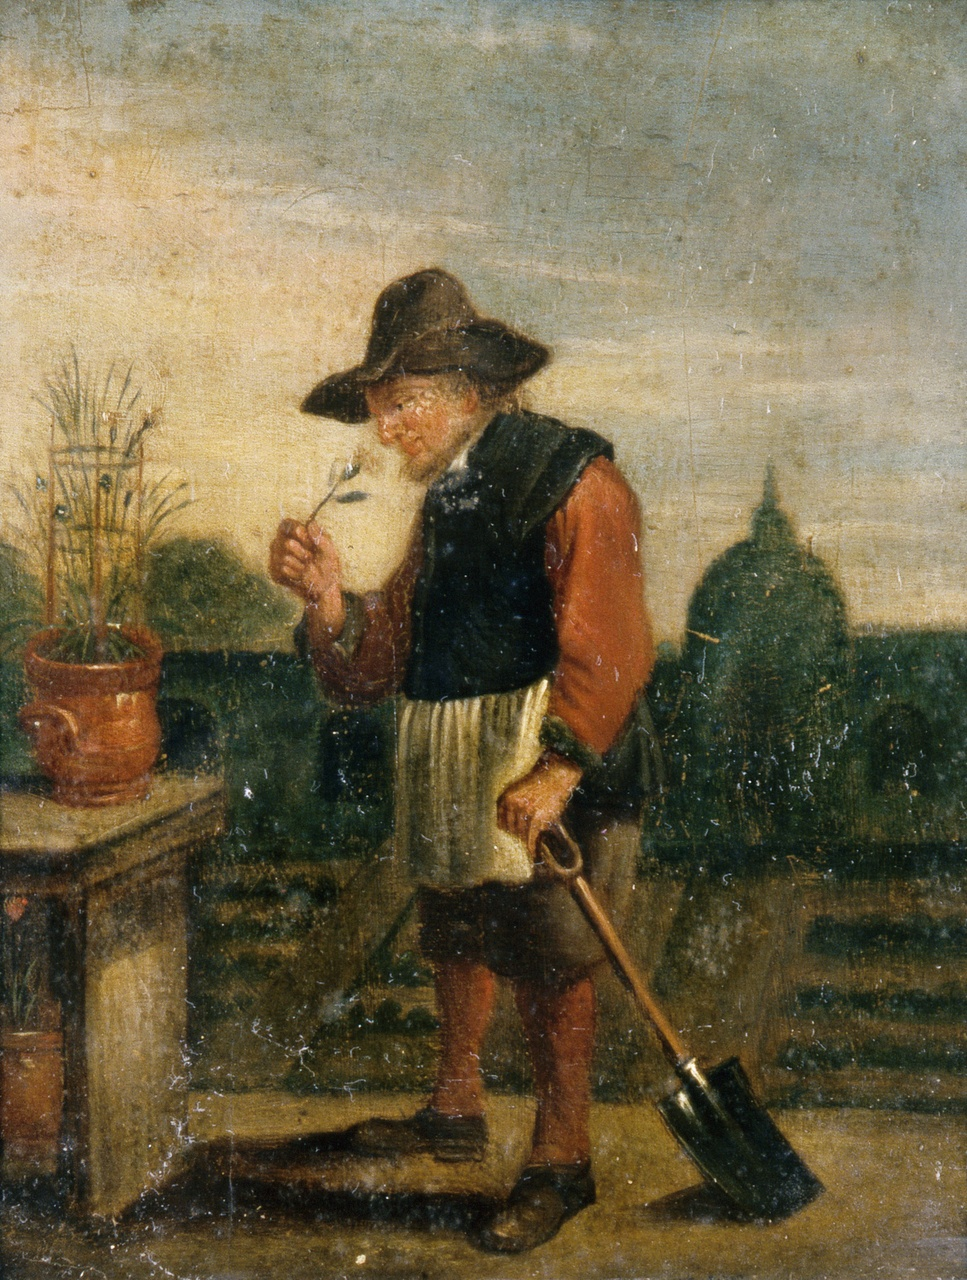 David Teniers II 'De reuk' Royal Pavilion & Museums, Brighton & Hove.jpg